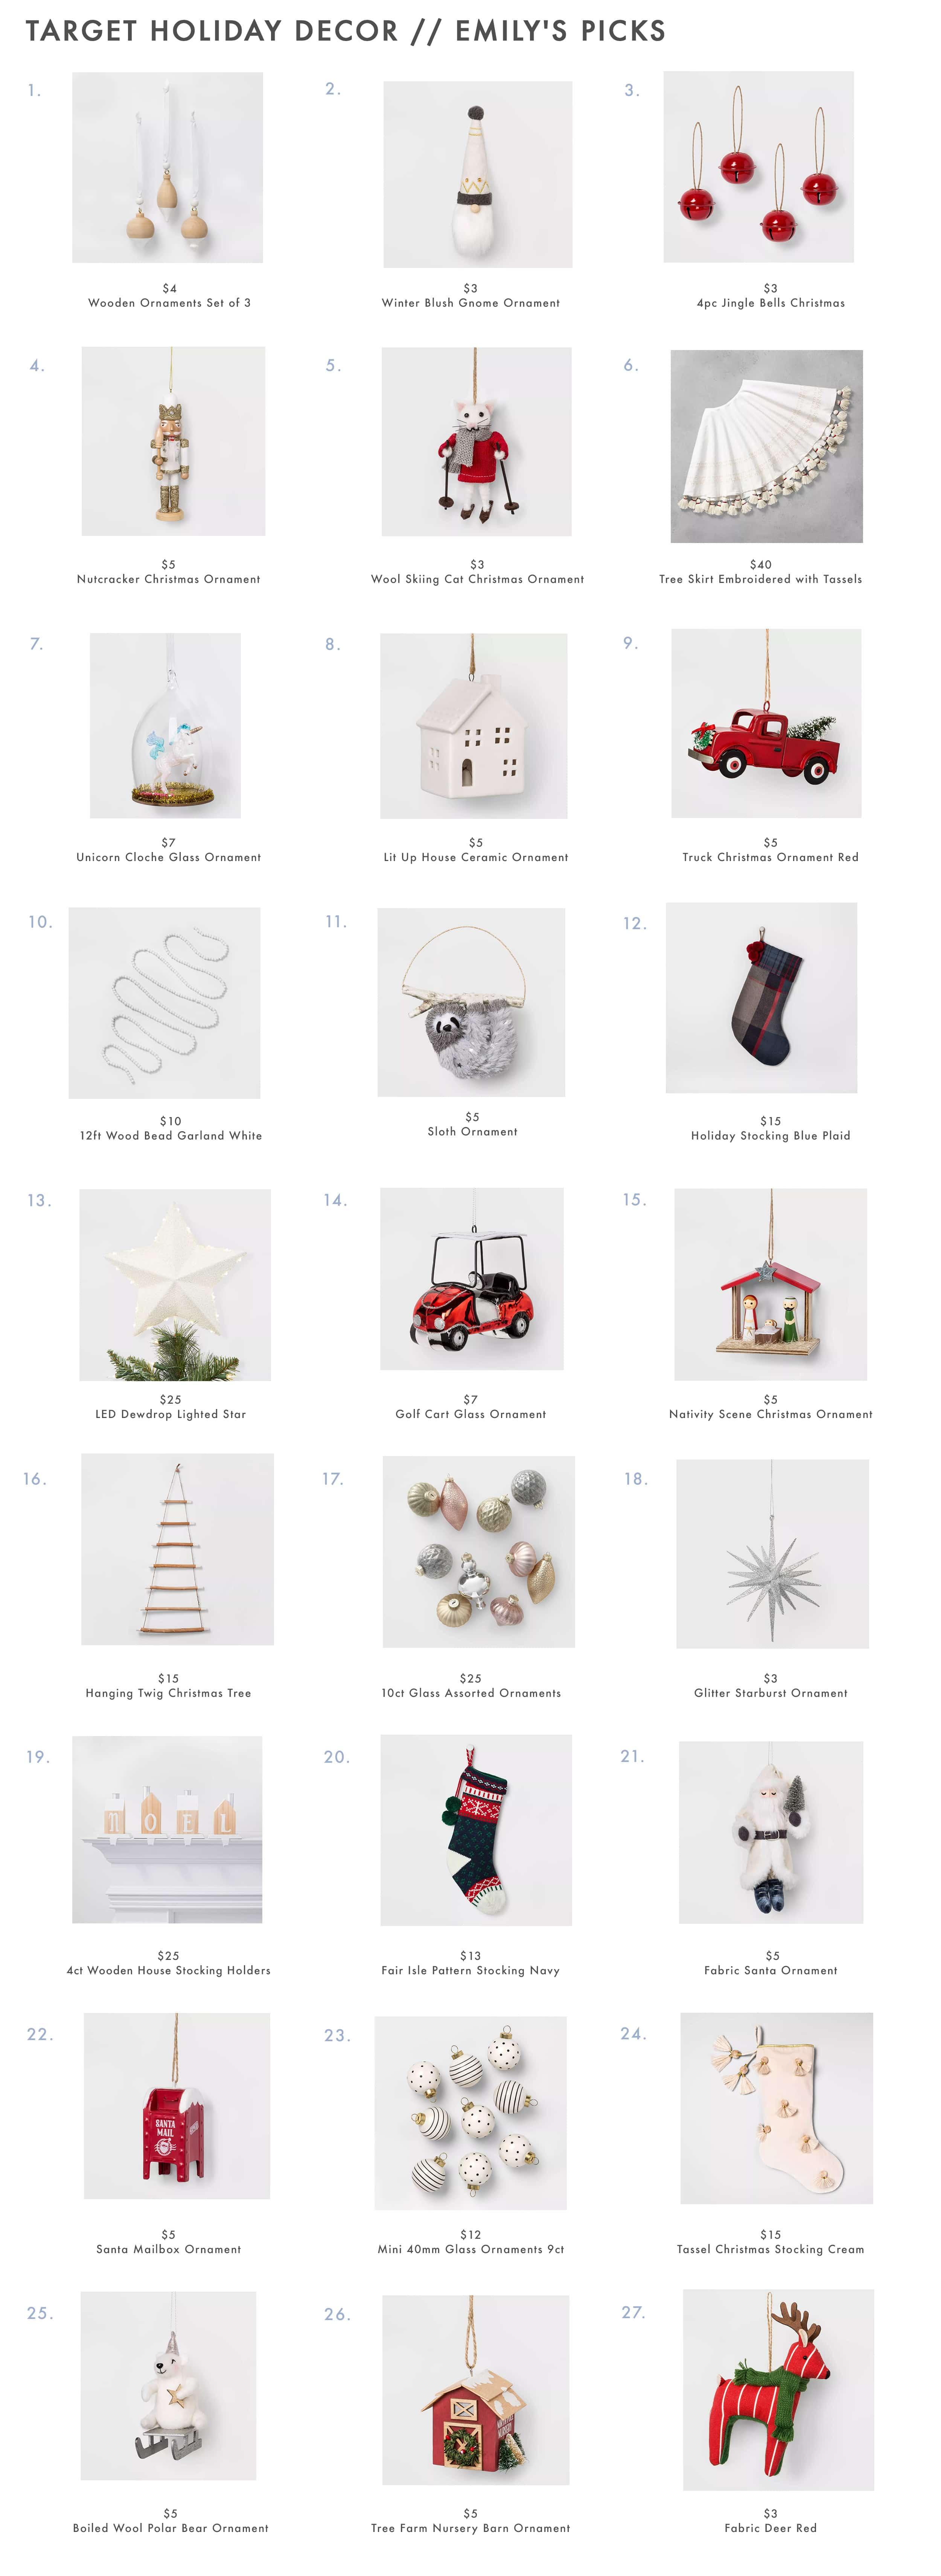 Target Holiday Decor Ornaments